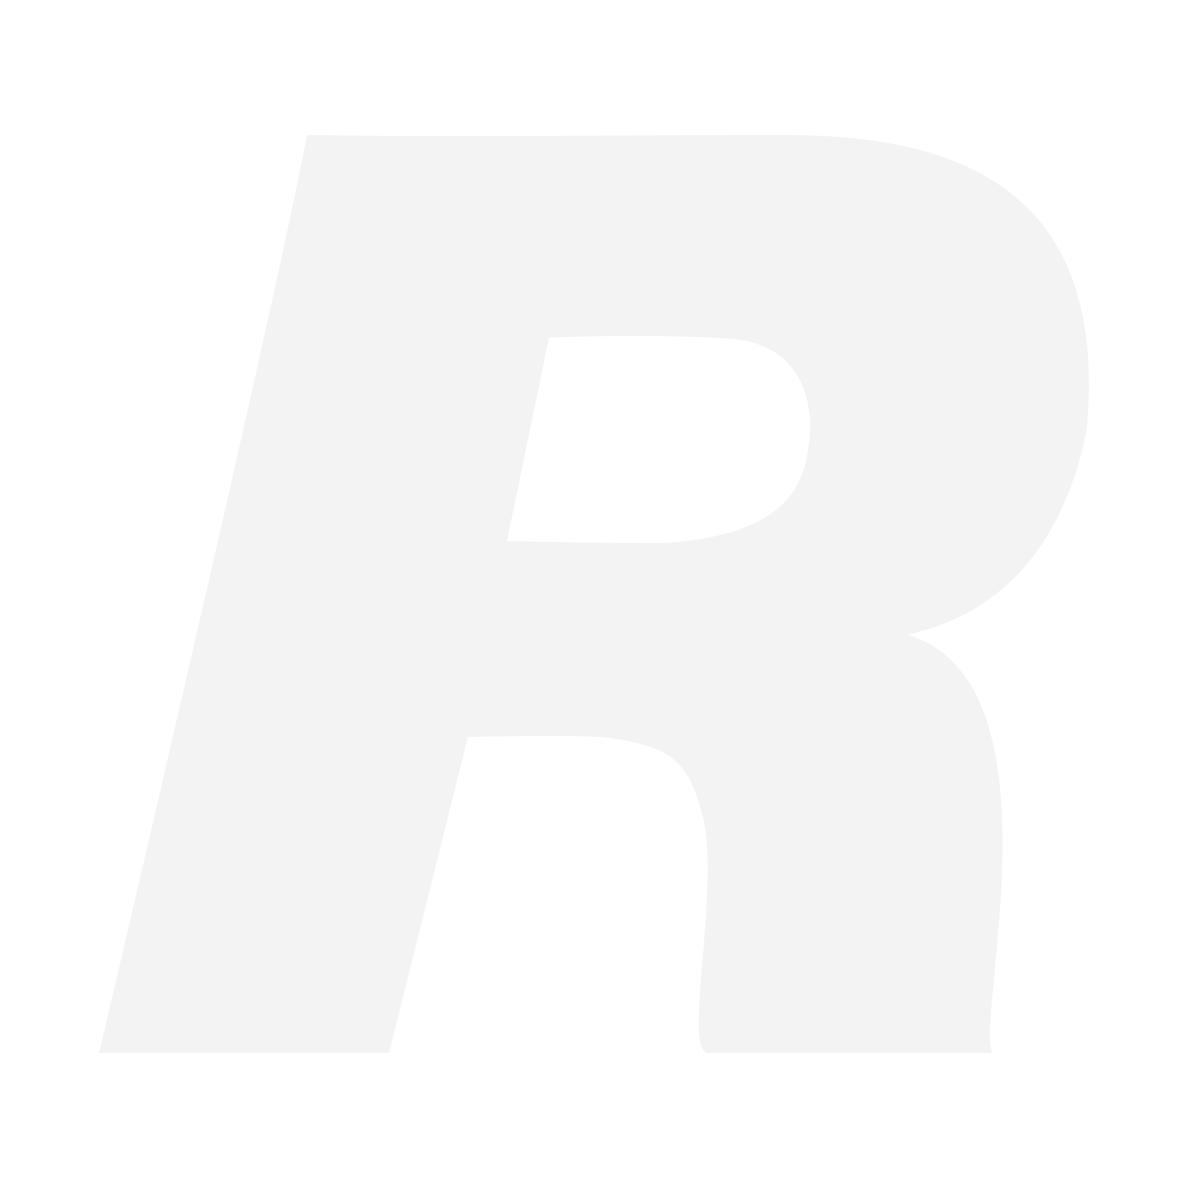 Voigtländer 12/5.6 Heliar Ultra Wide, Sony FE